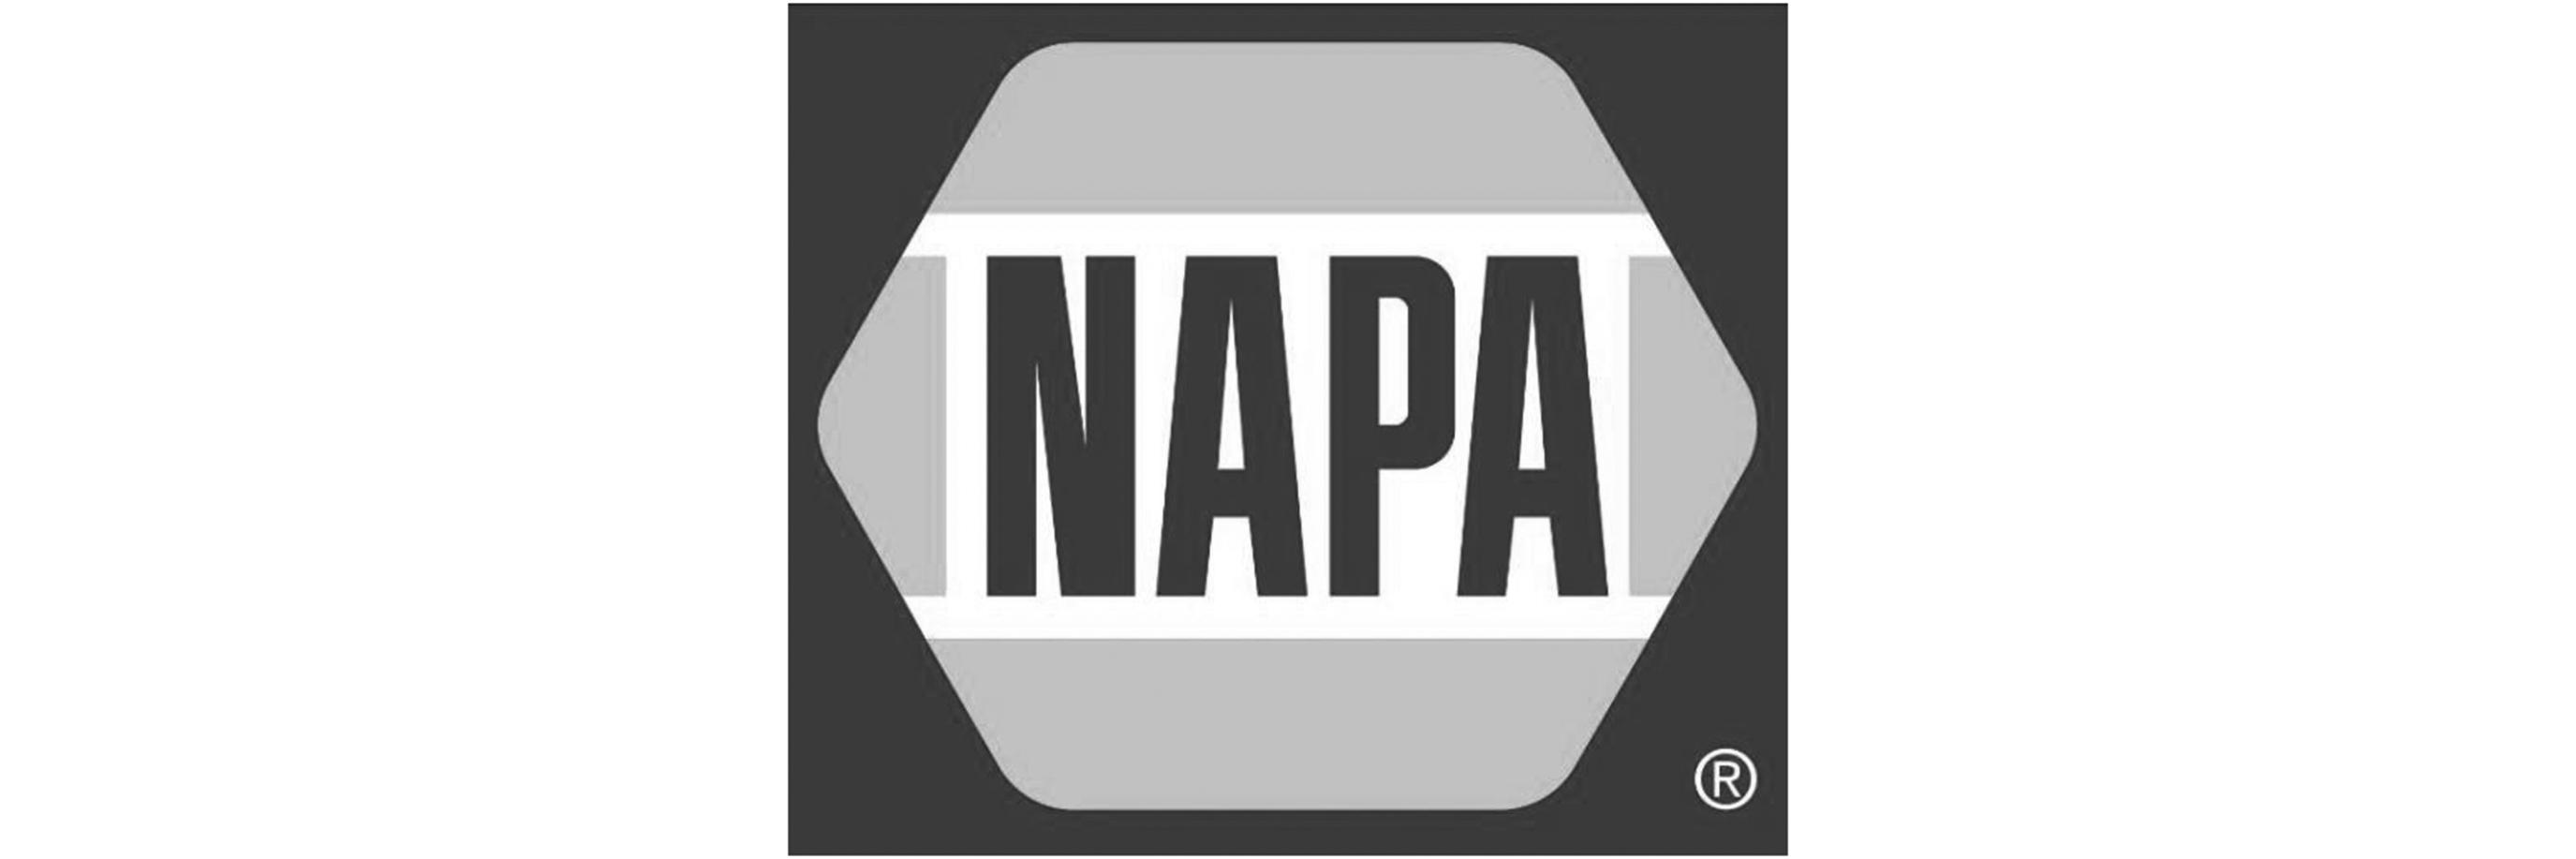 Genuine Parts Company NAPA